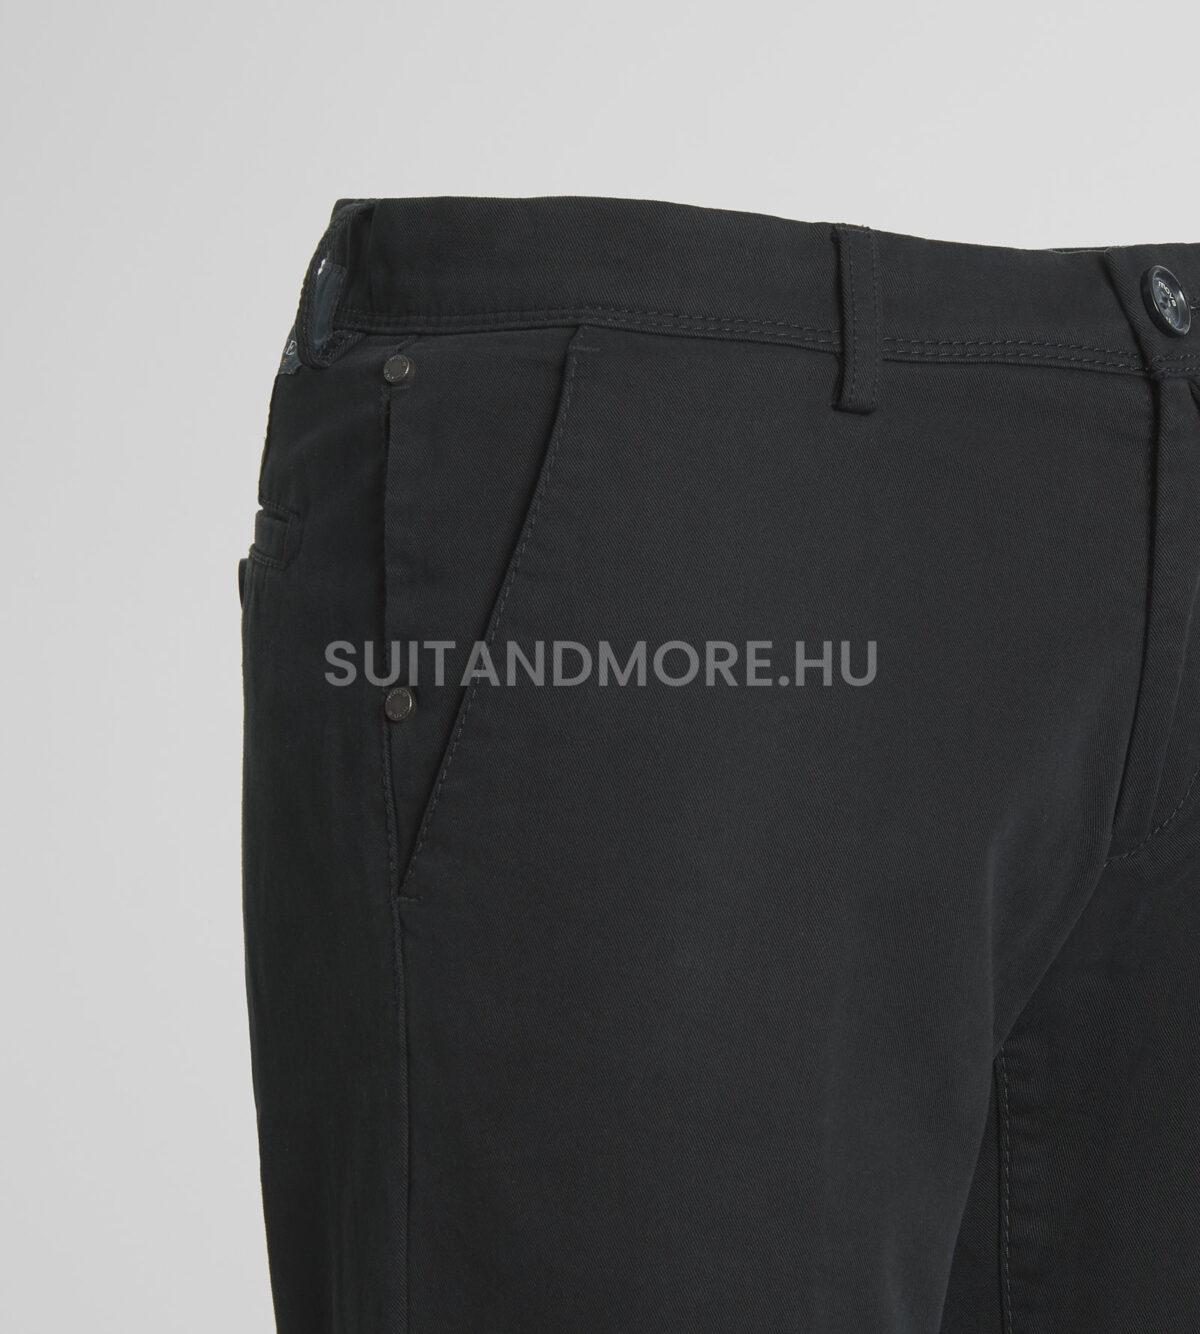 DIGEL-fekete-slim-fit-pamut-sztreccs-chino-nadrág-ARLINGTON-88160-10-02